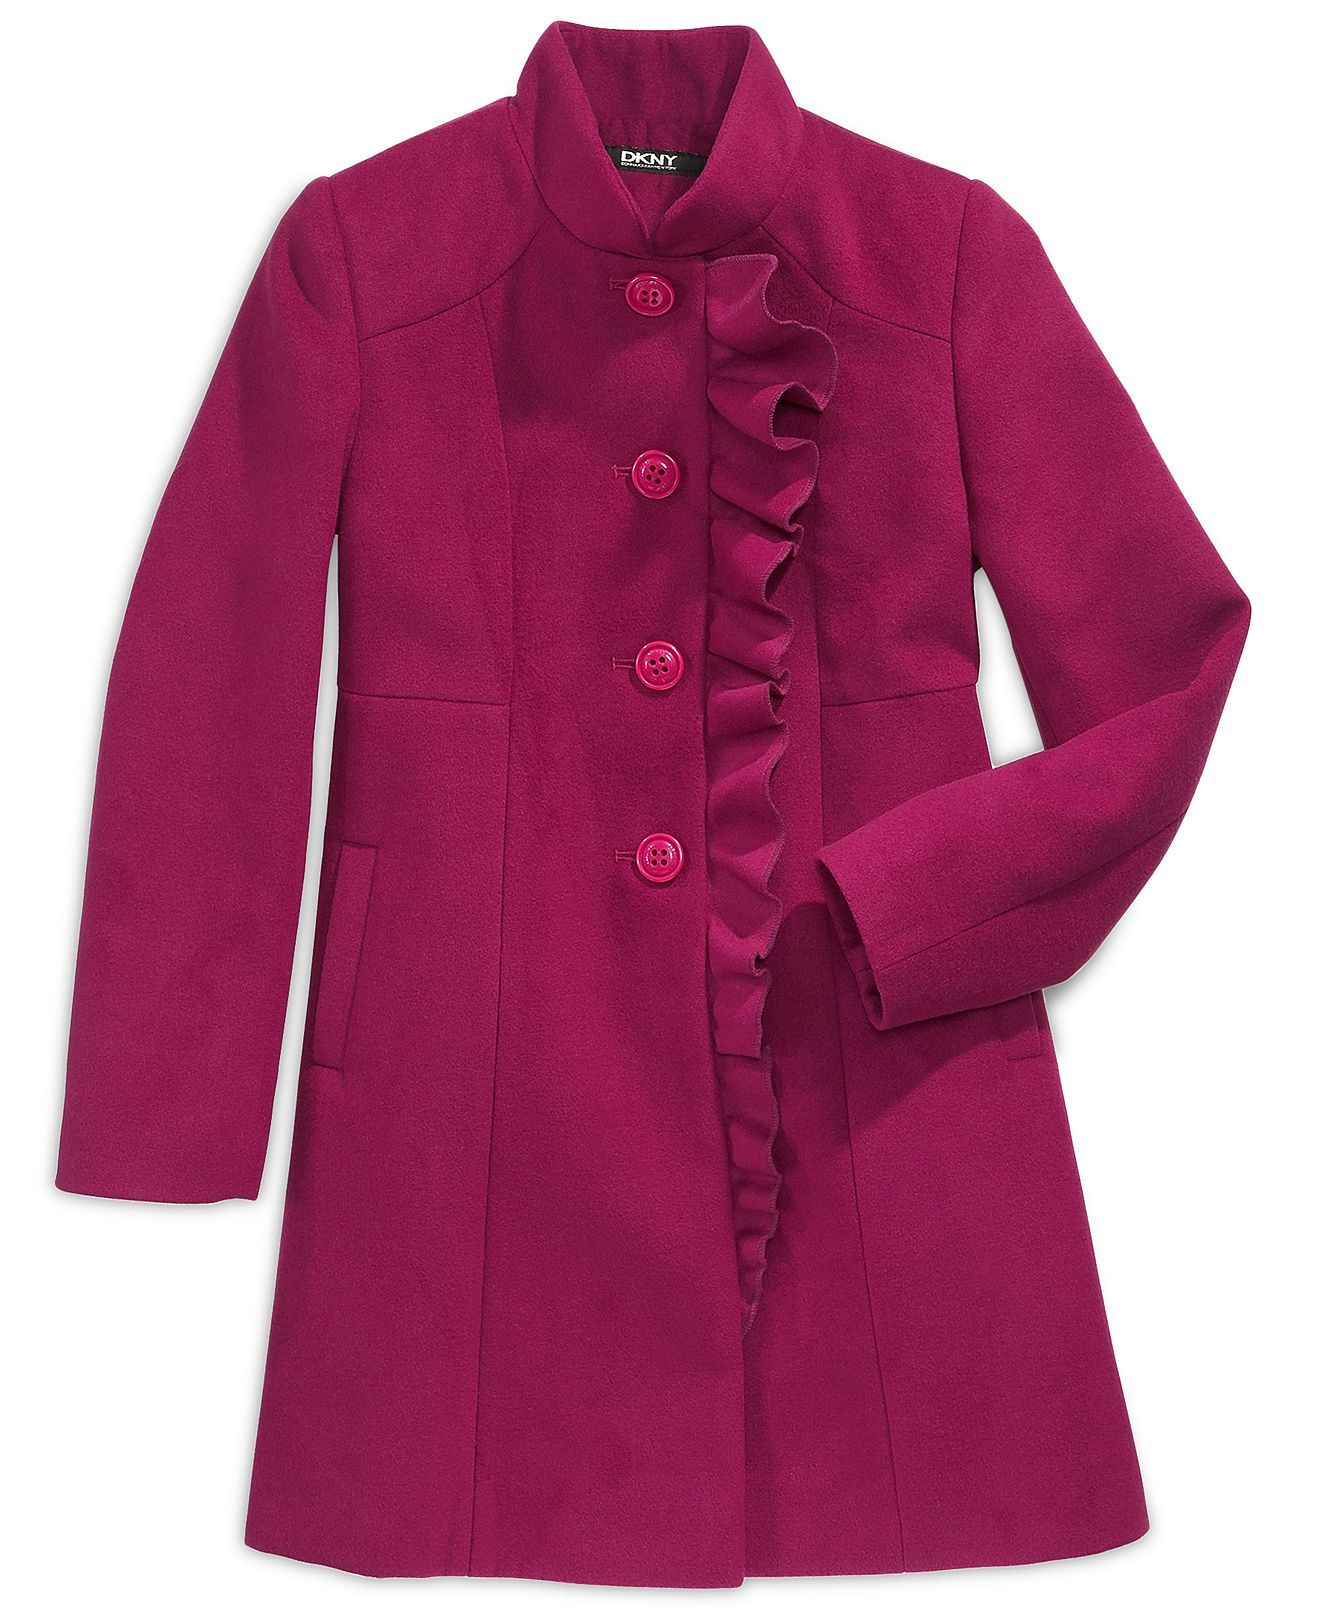 5430c5f56 DKNY Kids Jacket